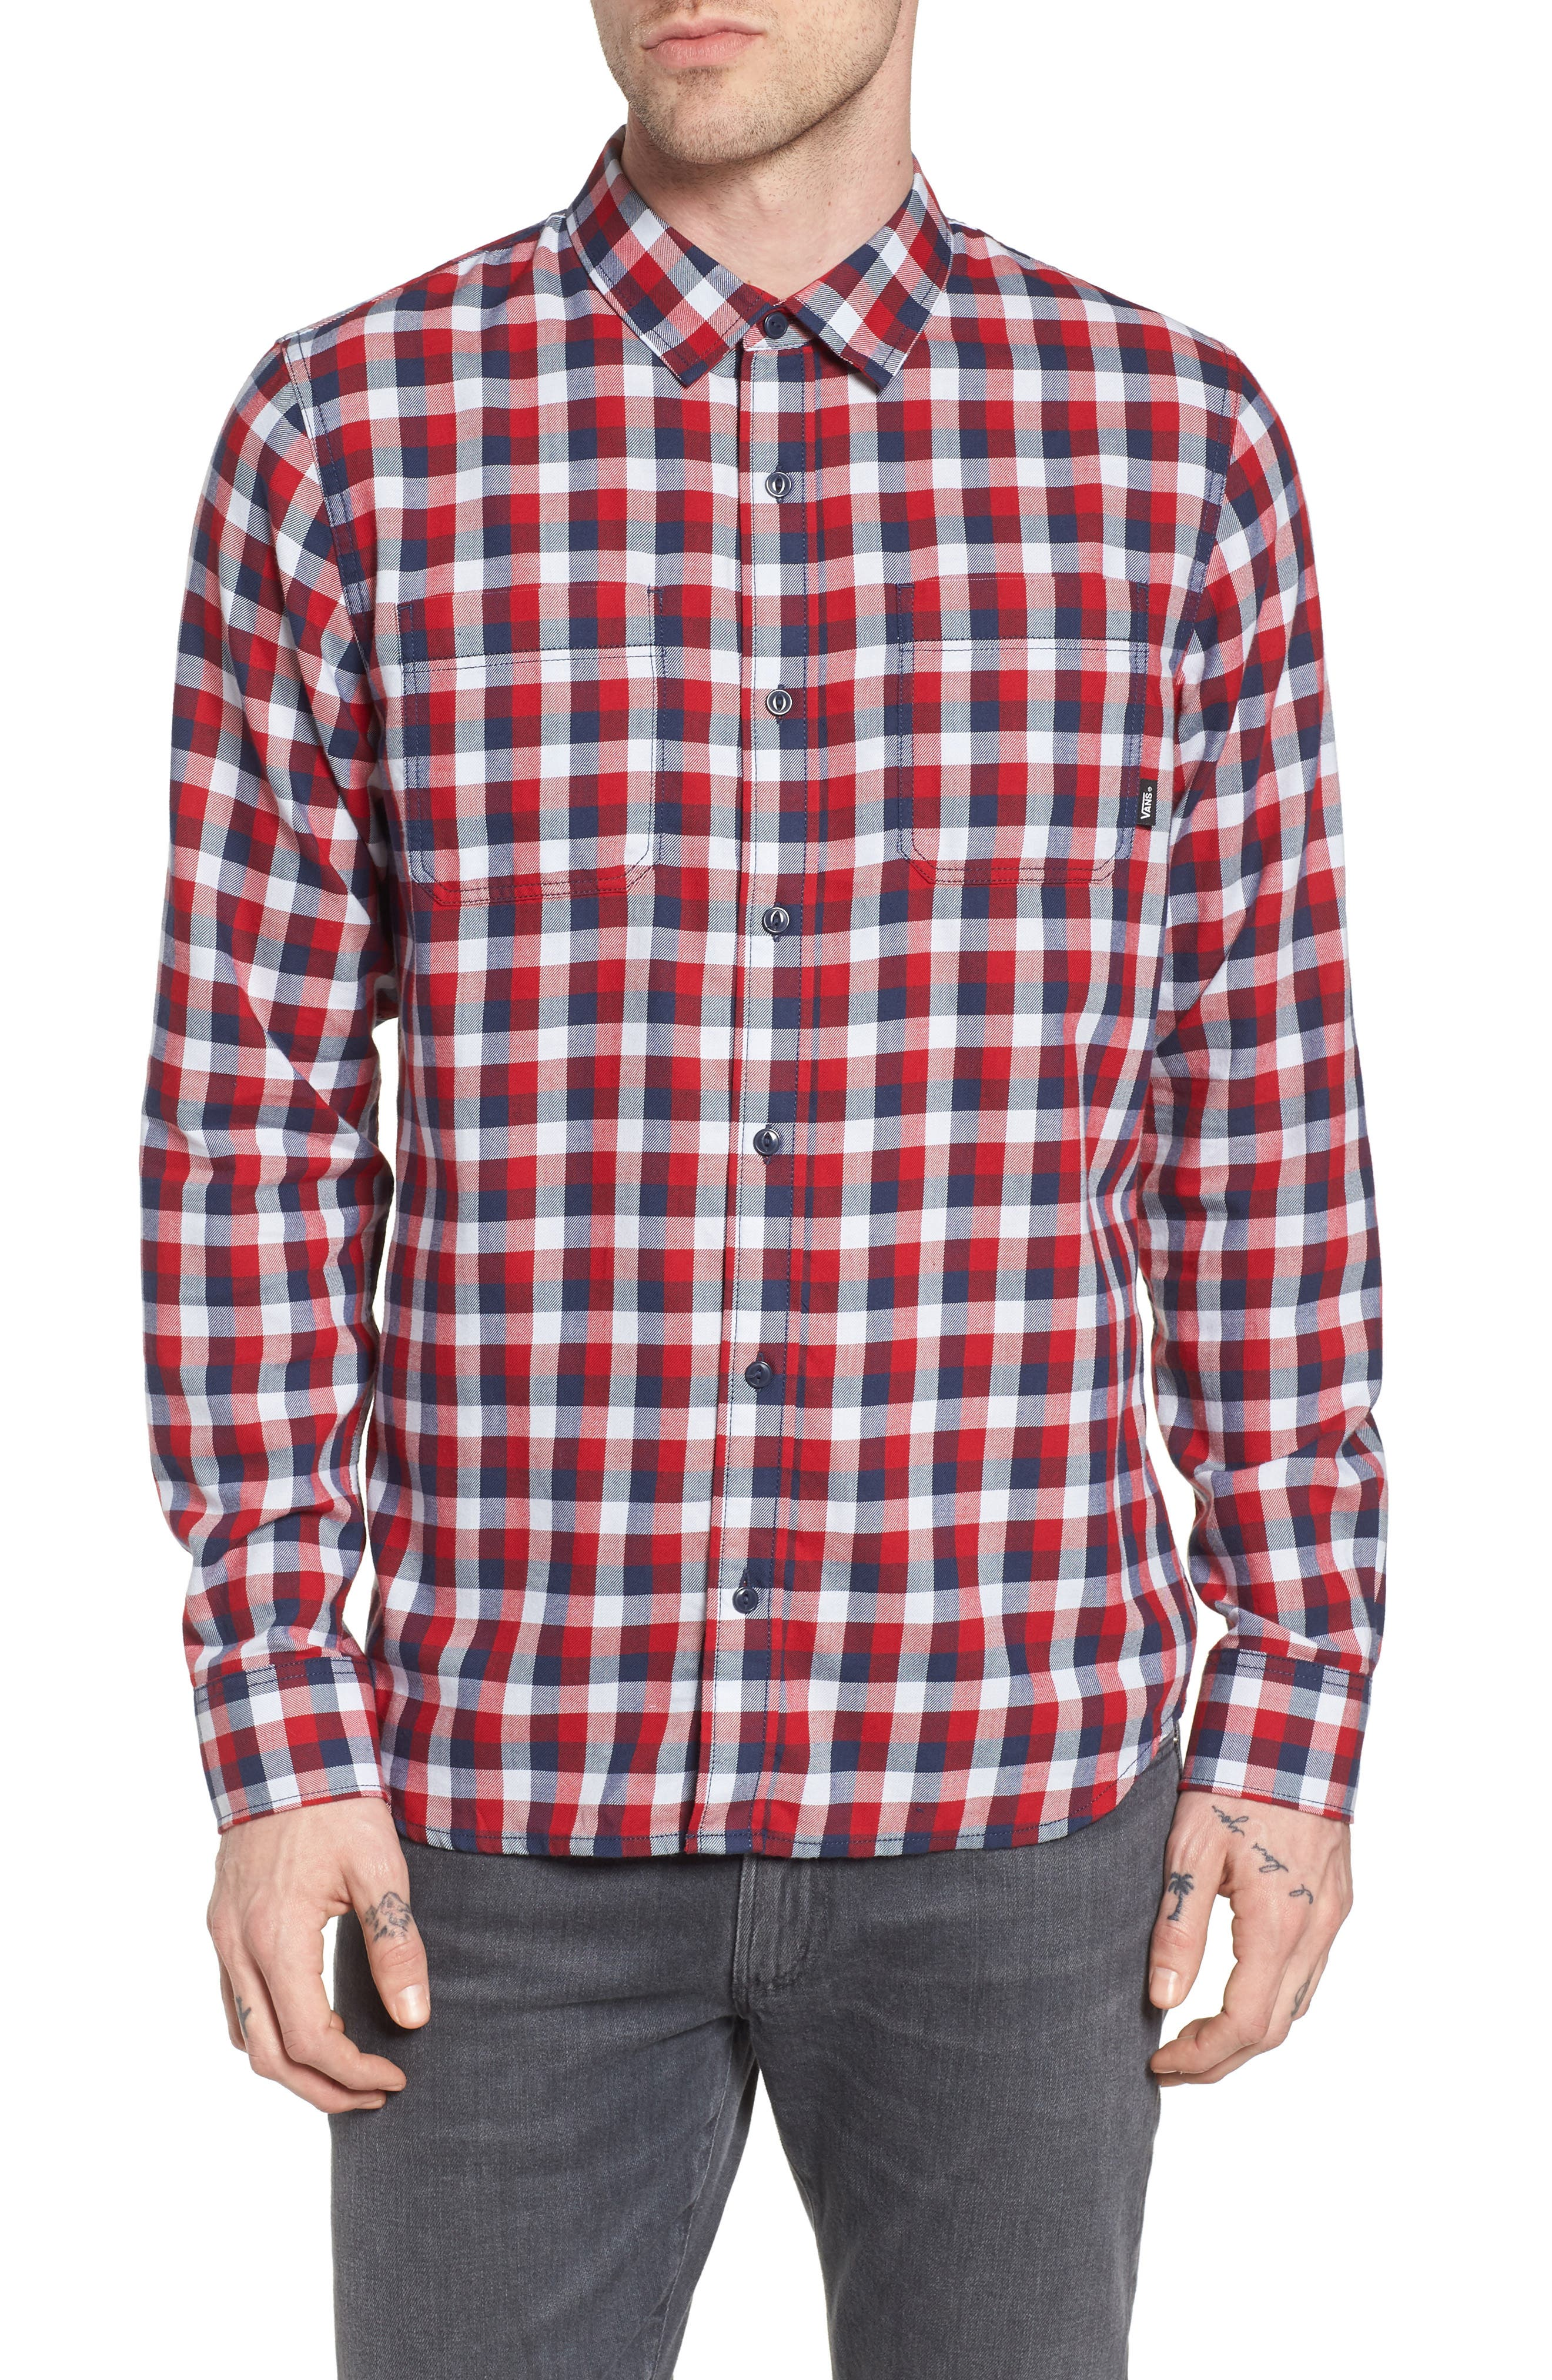 Alternate Image 1 Selected - Vans Alameda II Plaid Flannel Shirt